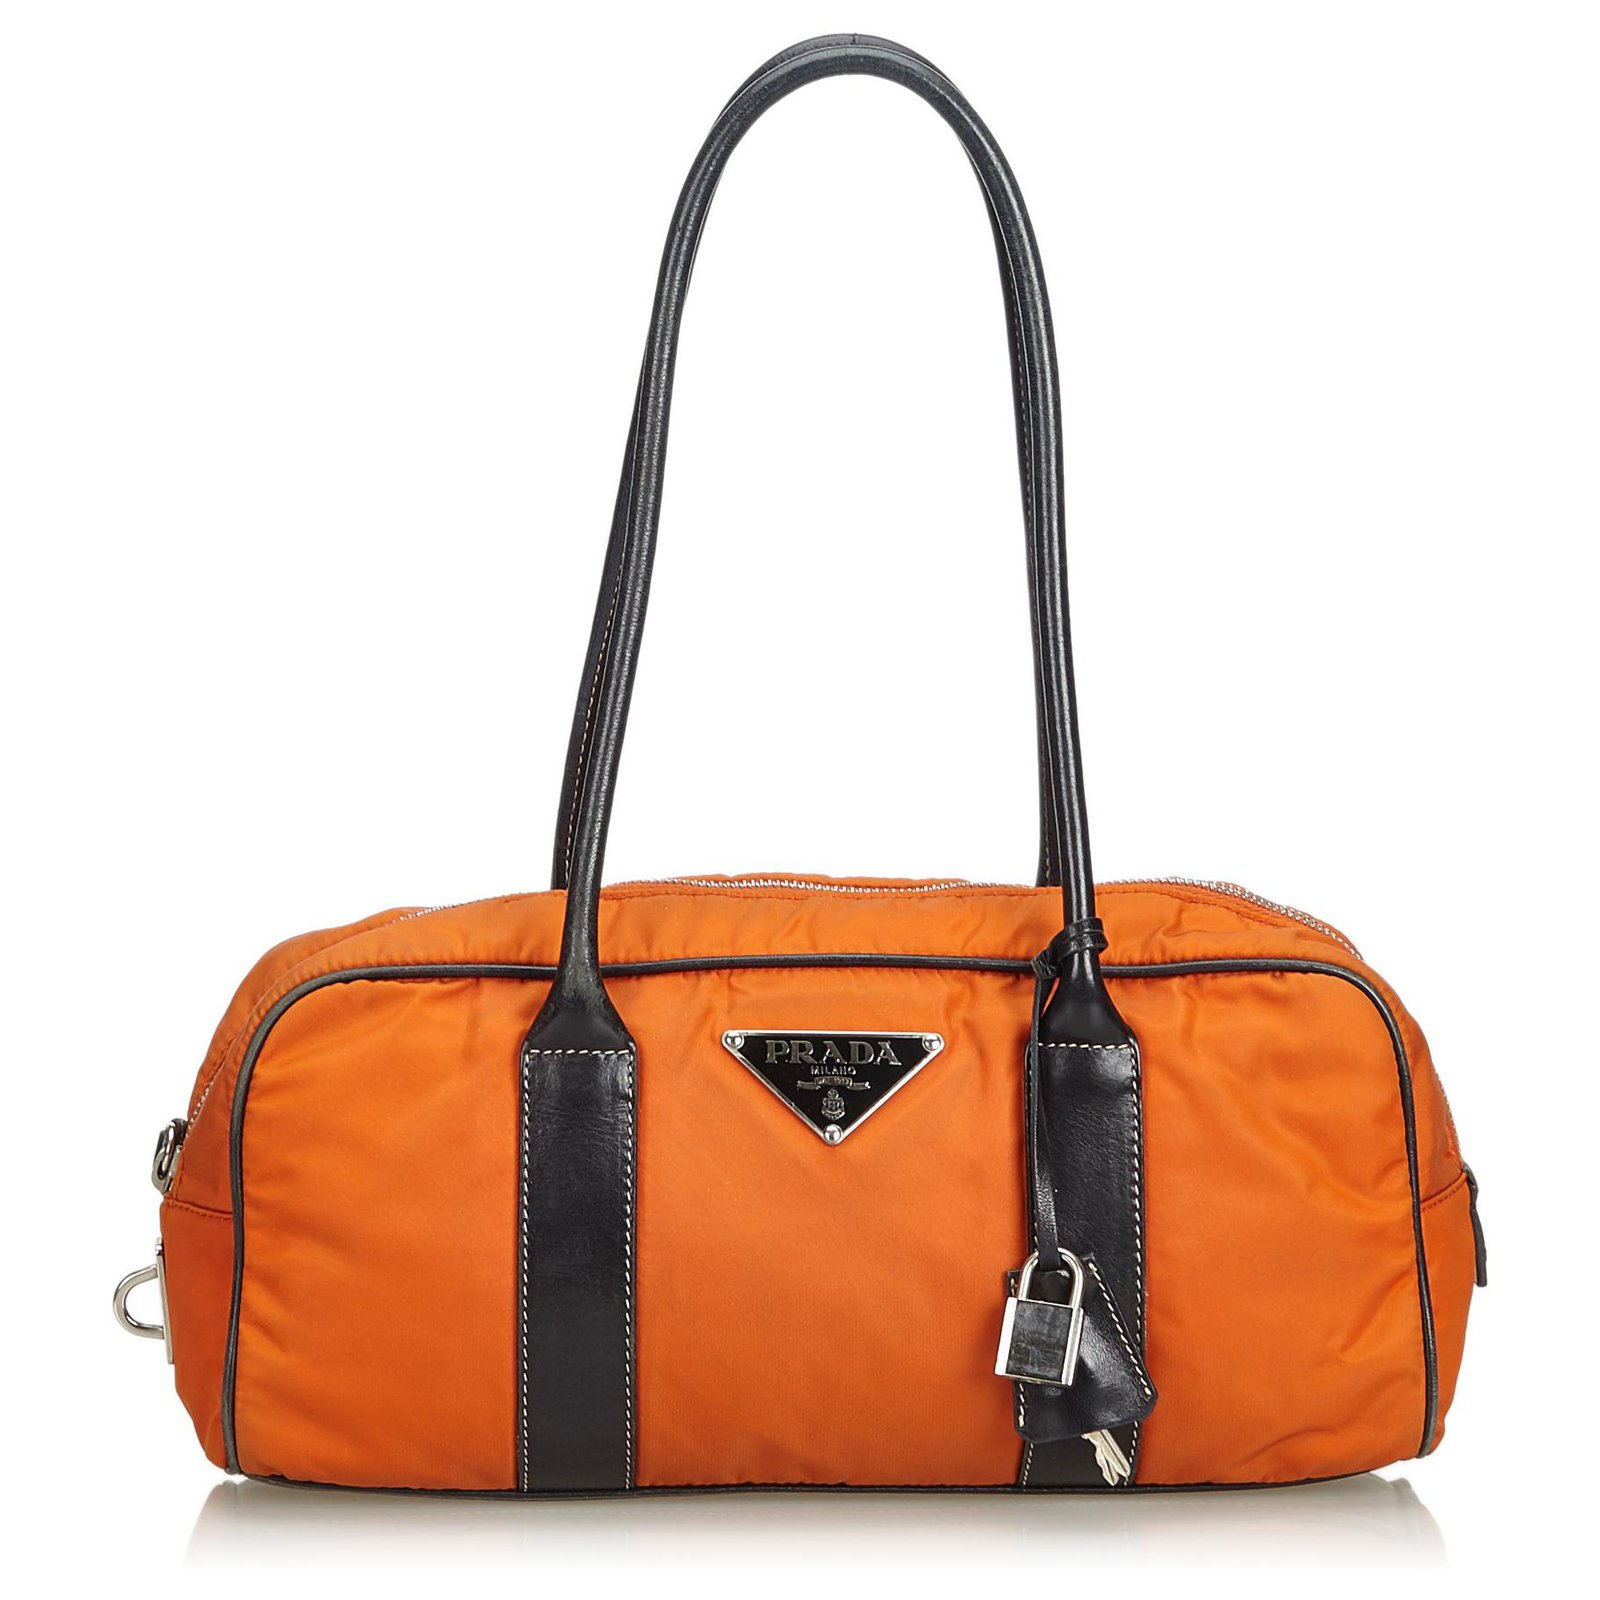 5f0942a2ed82 Prada Prada Orange Nylon Shoulder Bag Handbags Leather,Other,Nylon,Cloth  Black,